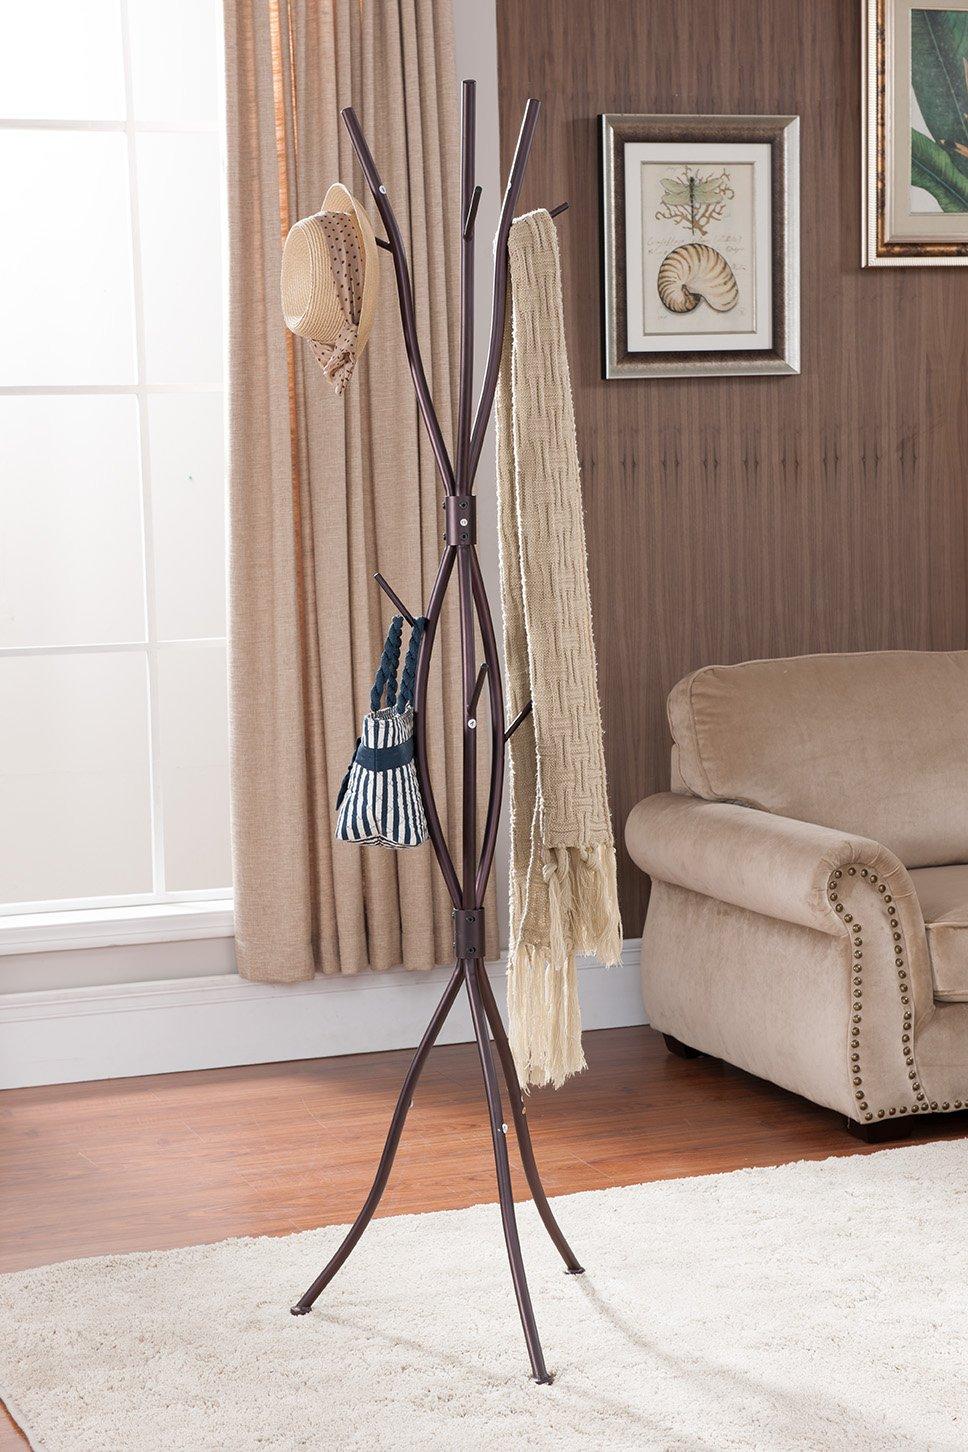 Attractive Amazon.com: Kings Brand Bronze Finish Metal Tree Branches Coat U0026 Hat Rack  Stand: Kitchen U0026 Dining